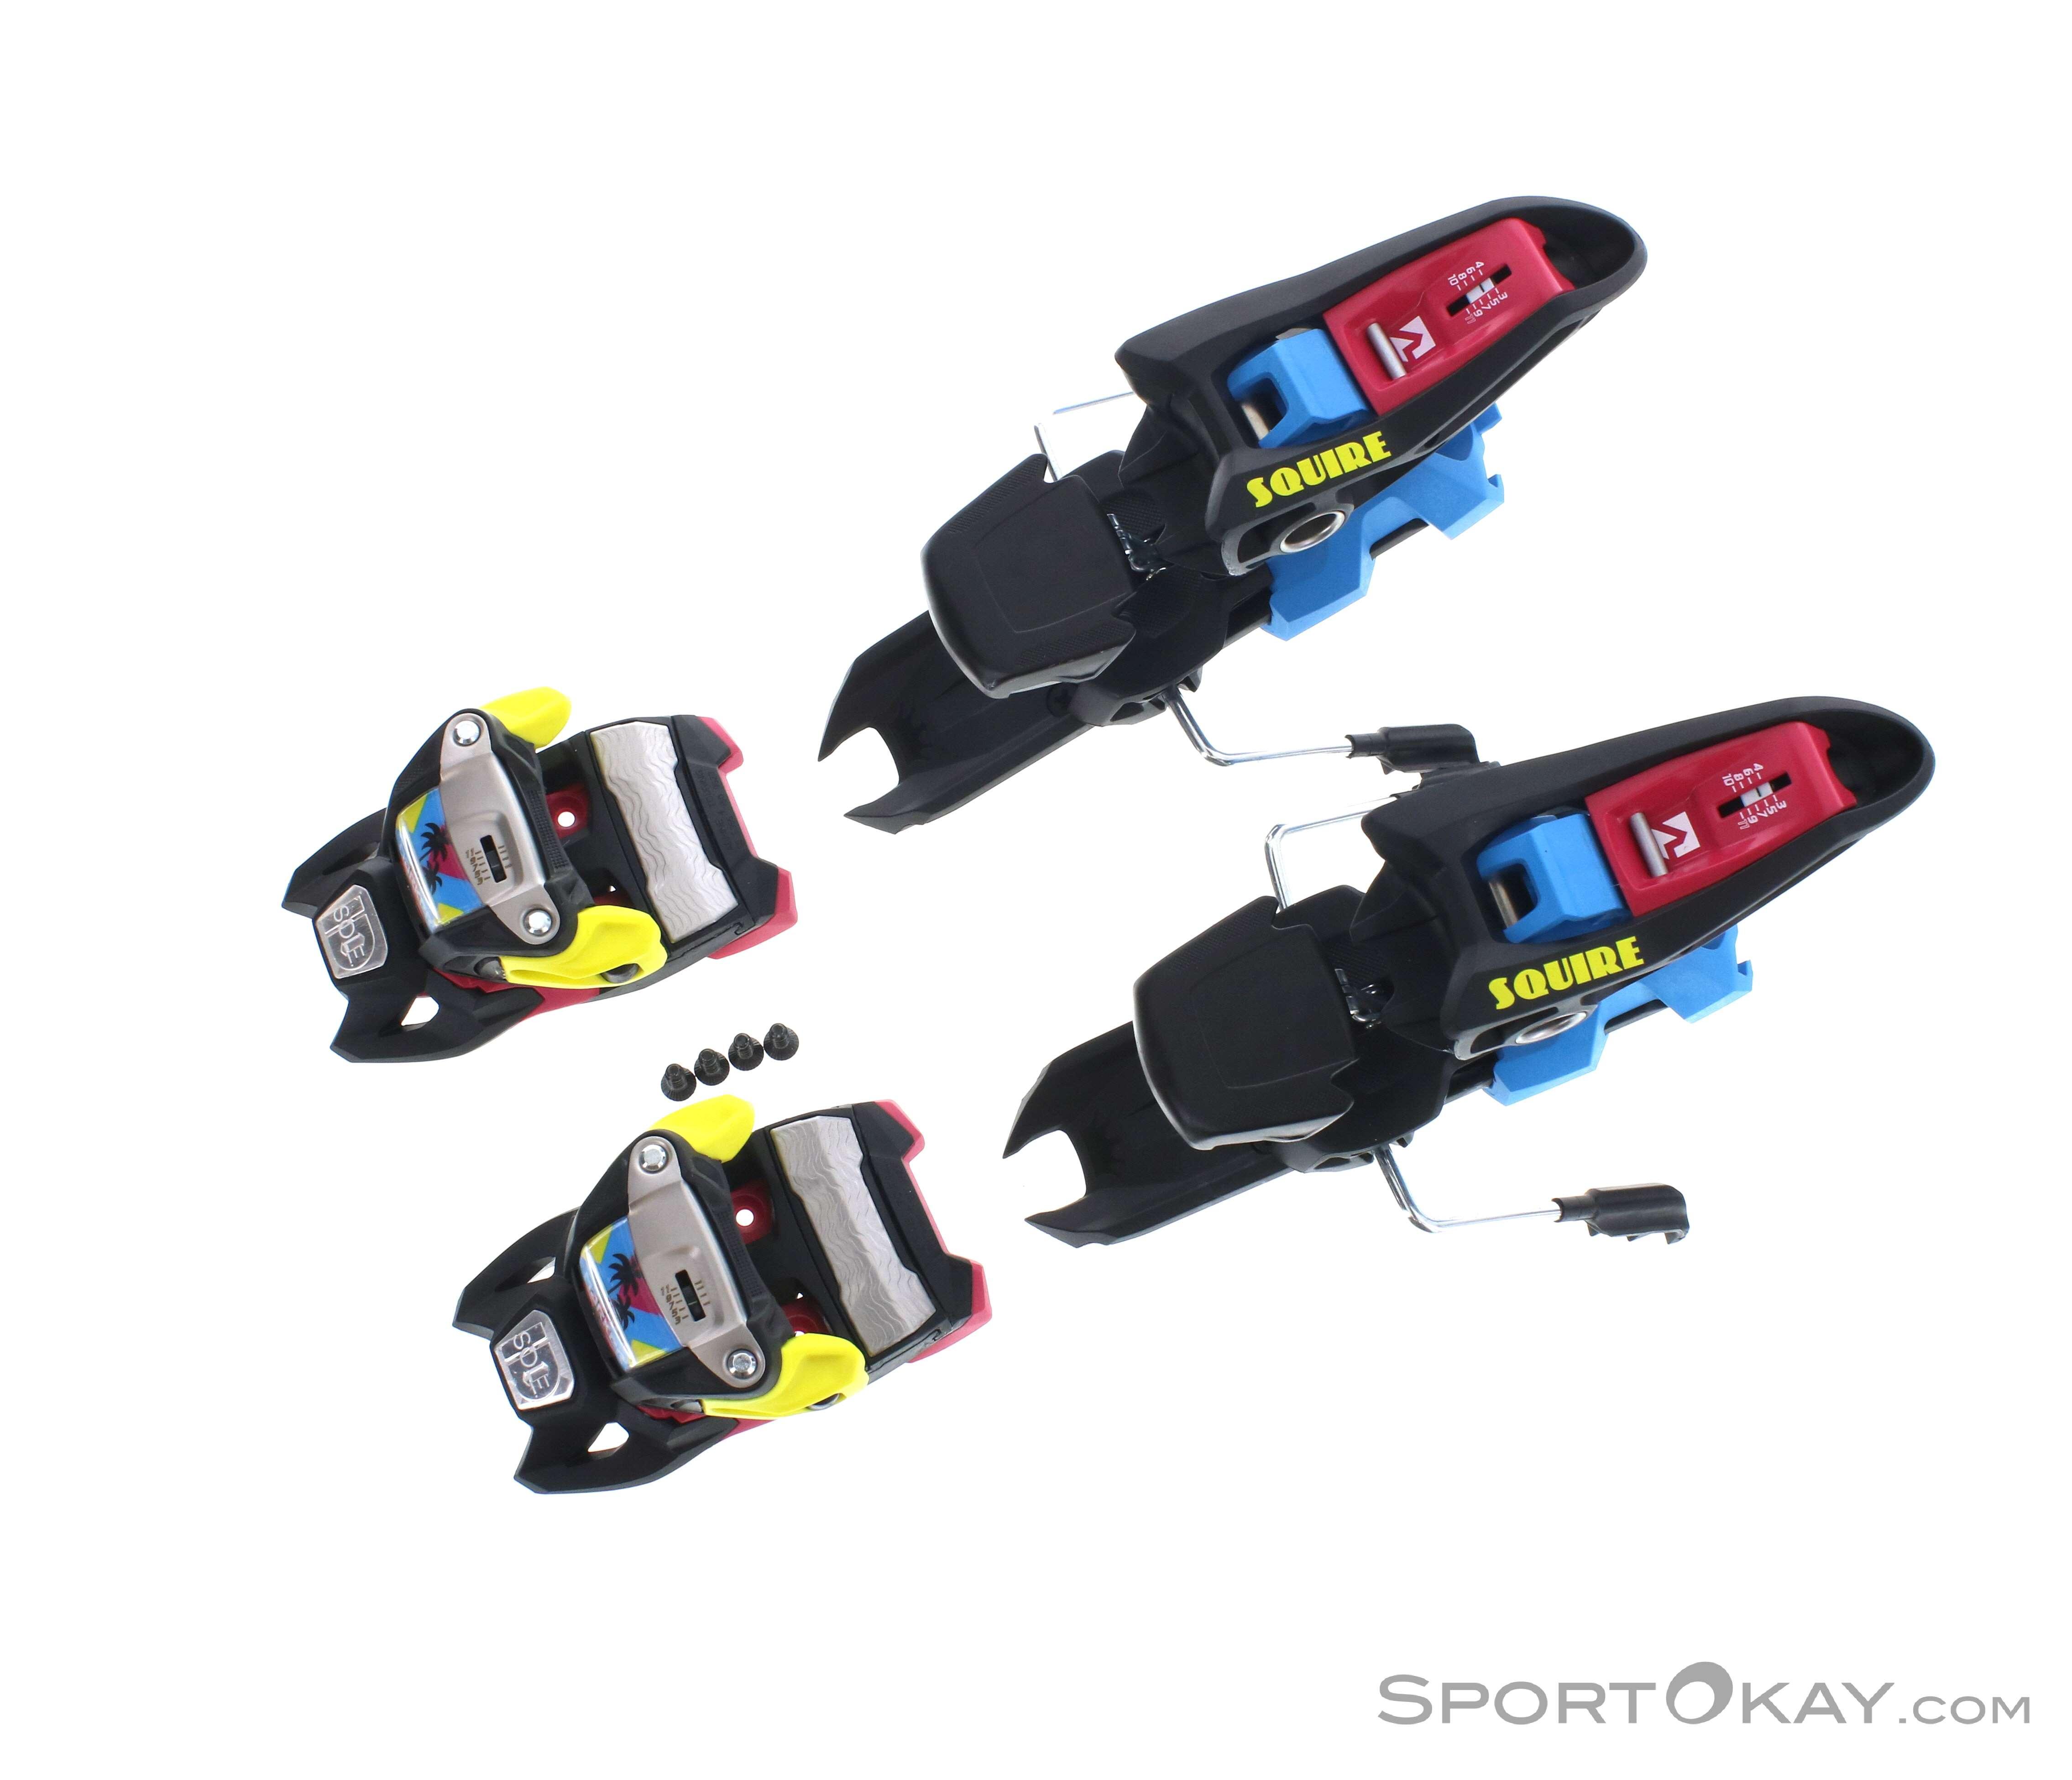 Bindungen Marker Squire 11 ID Freeridebindung Skibindung NEU Skisport & Snowboarding